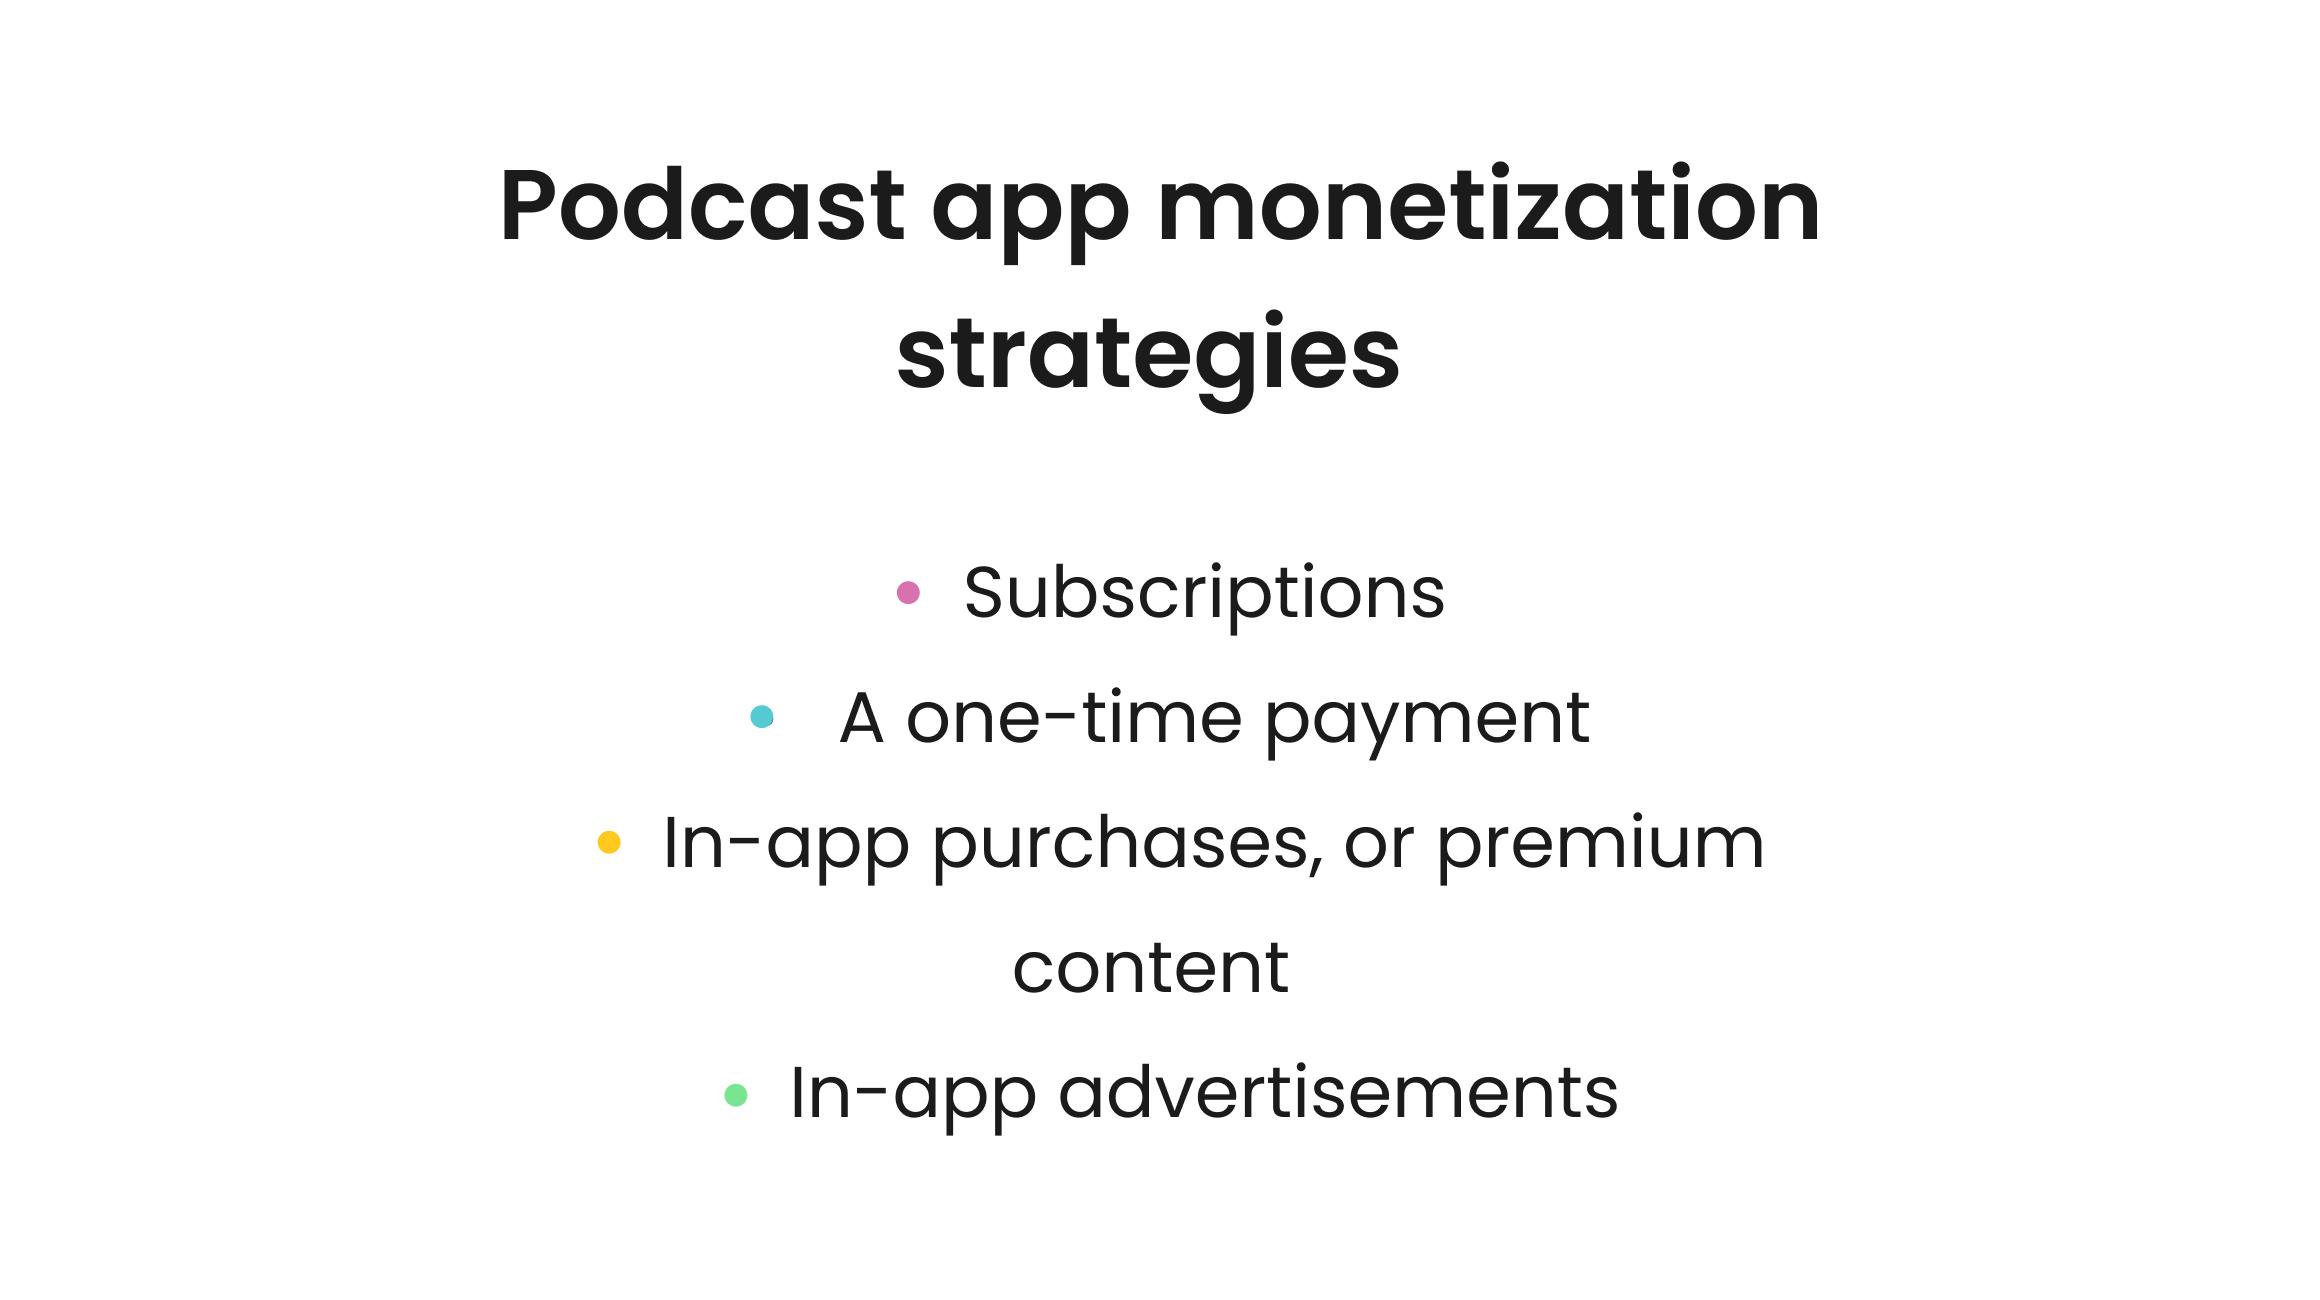 https://images.ctfassets.net/0nm5vlv2ad7a/3MlcSJUwKF5xphCrDJ9P5f/891dc5ed665e85373389a1c6c2223e39/podcast_app_monetization.png